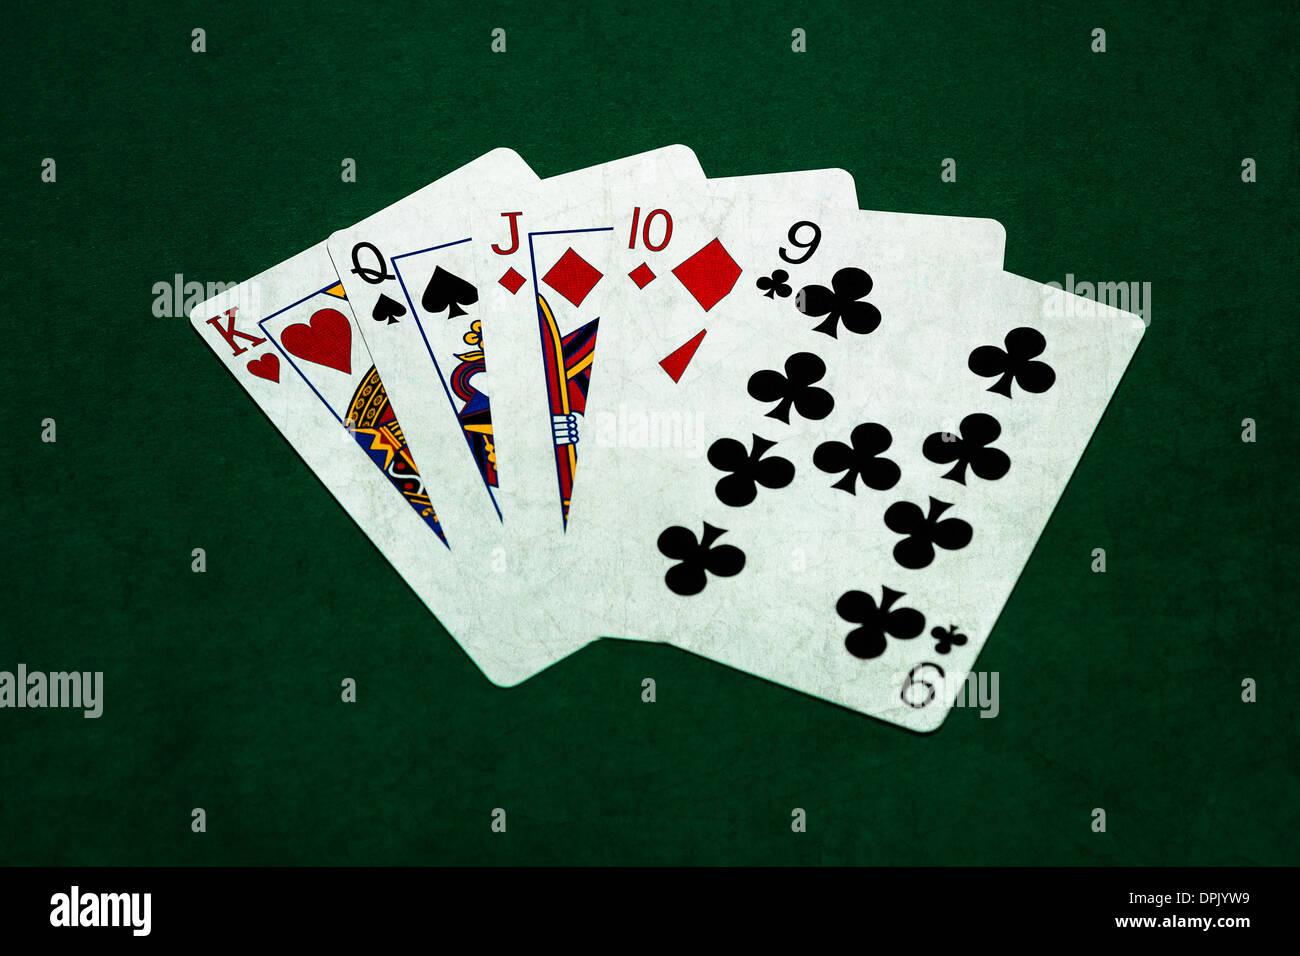 12345 straight poker sunday poker tournaments